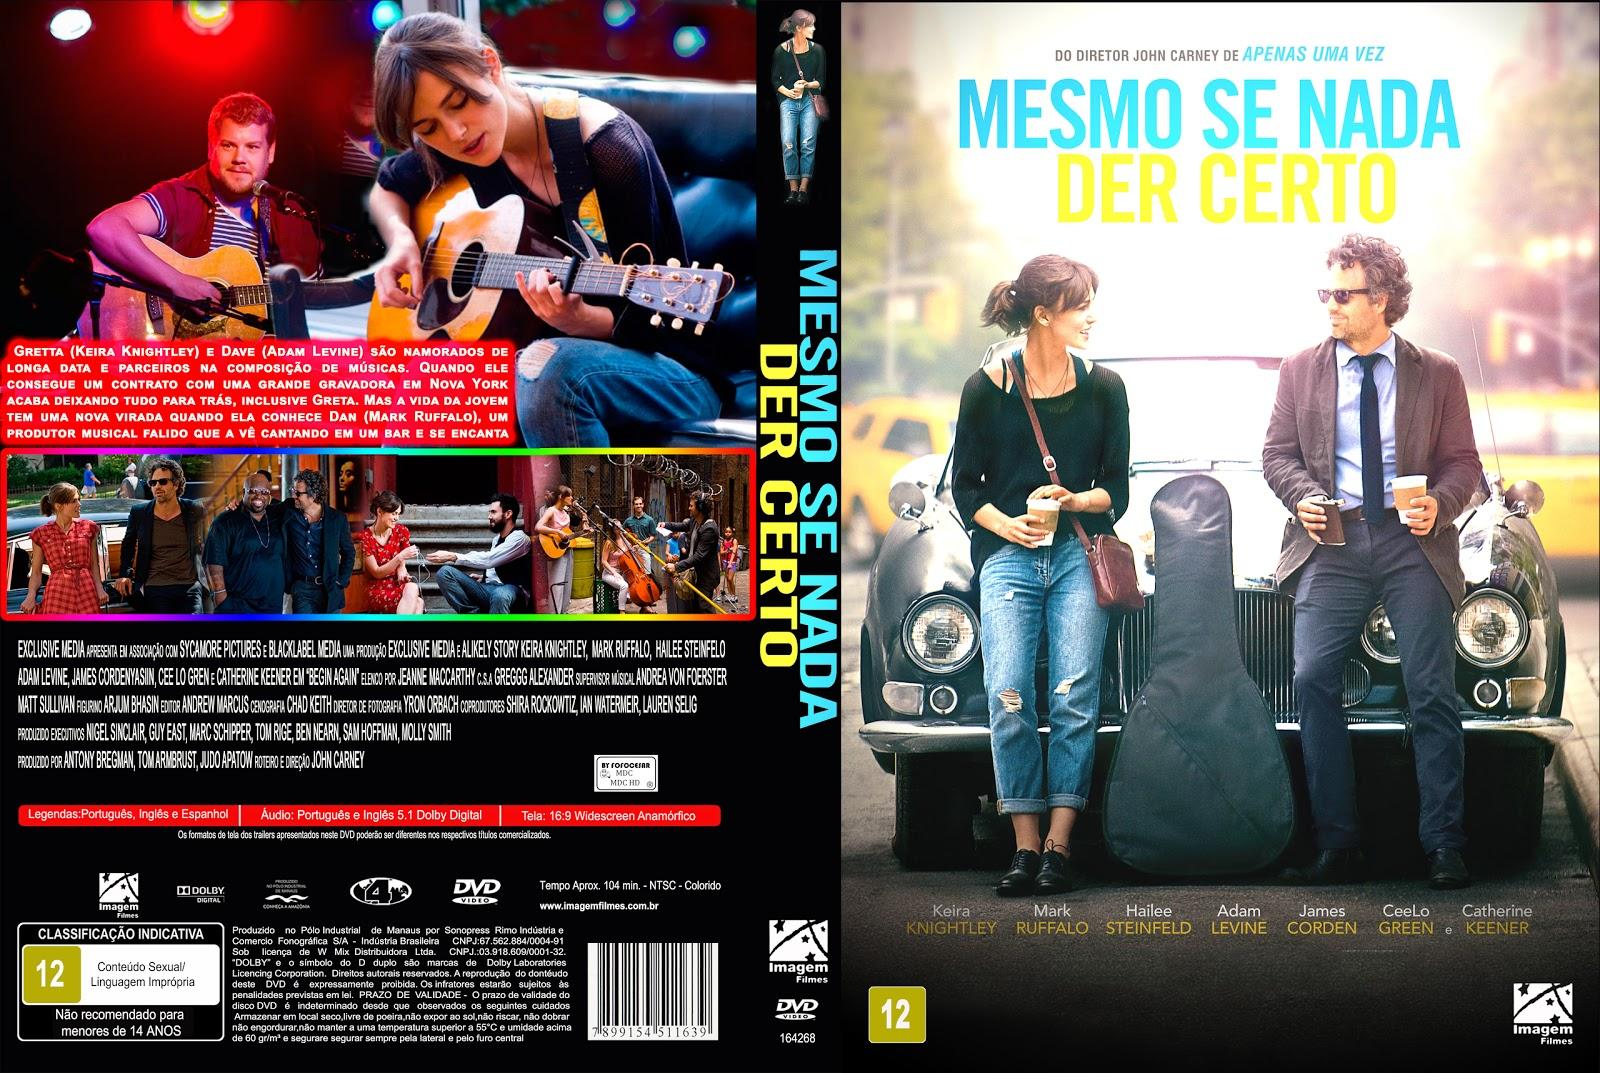 Capa DVD Mesmo Se Nada Der Certo